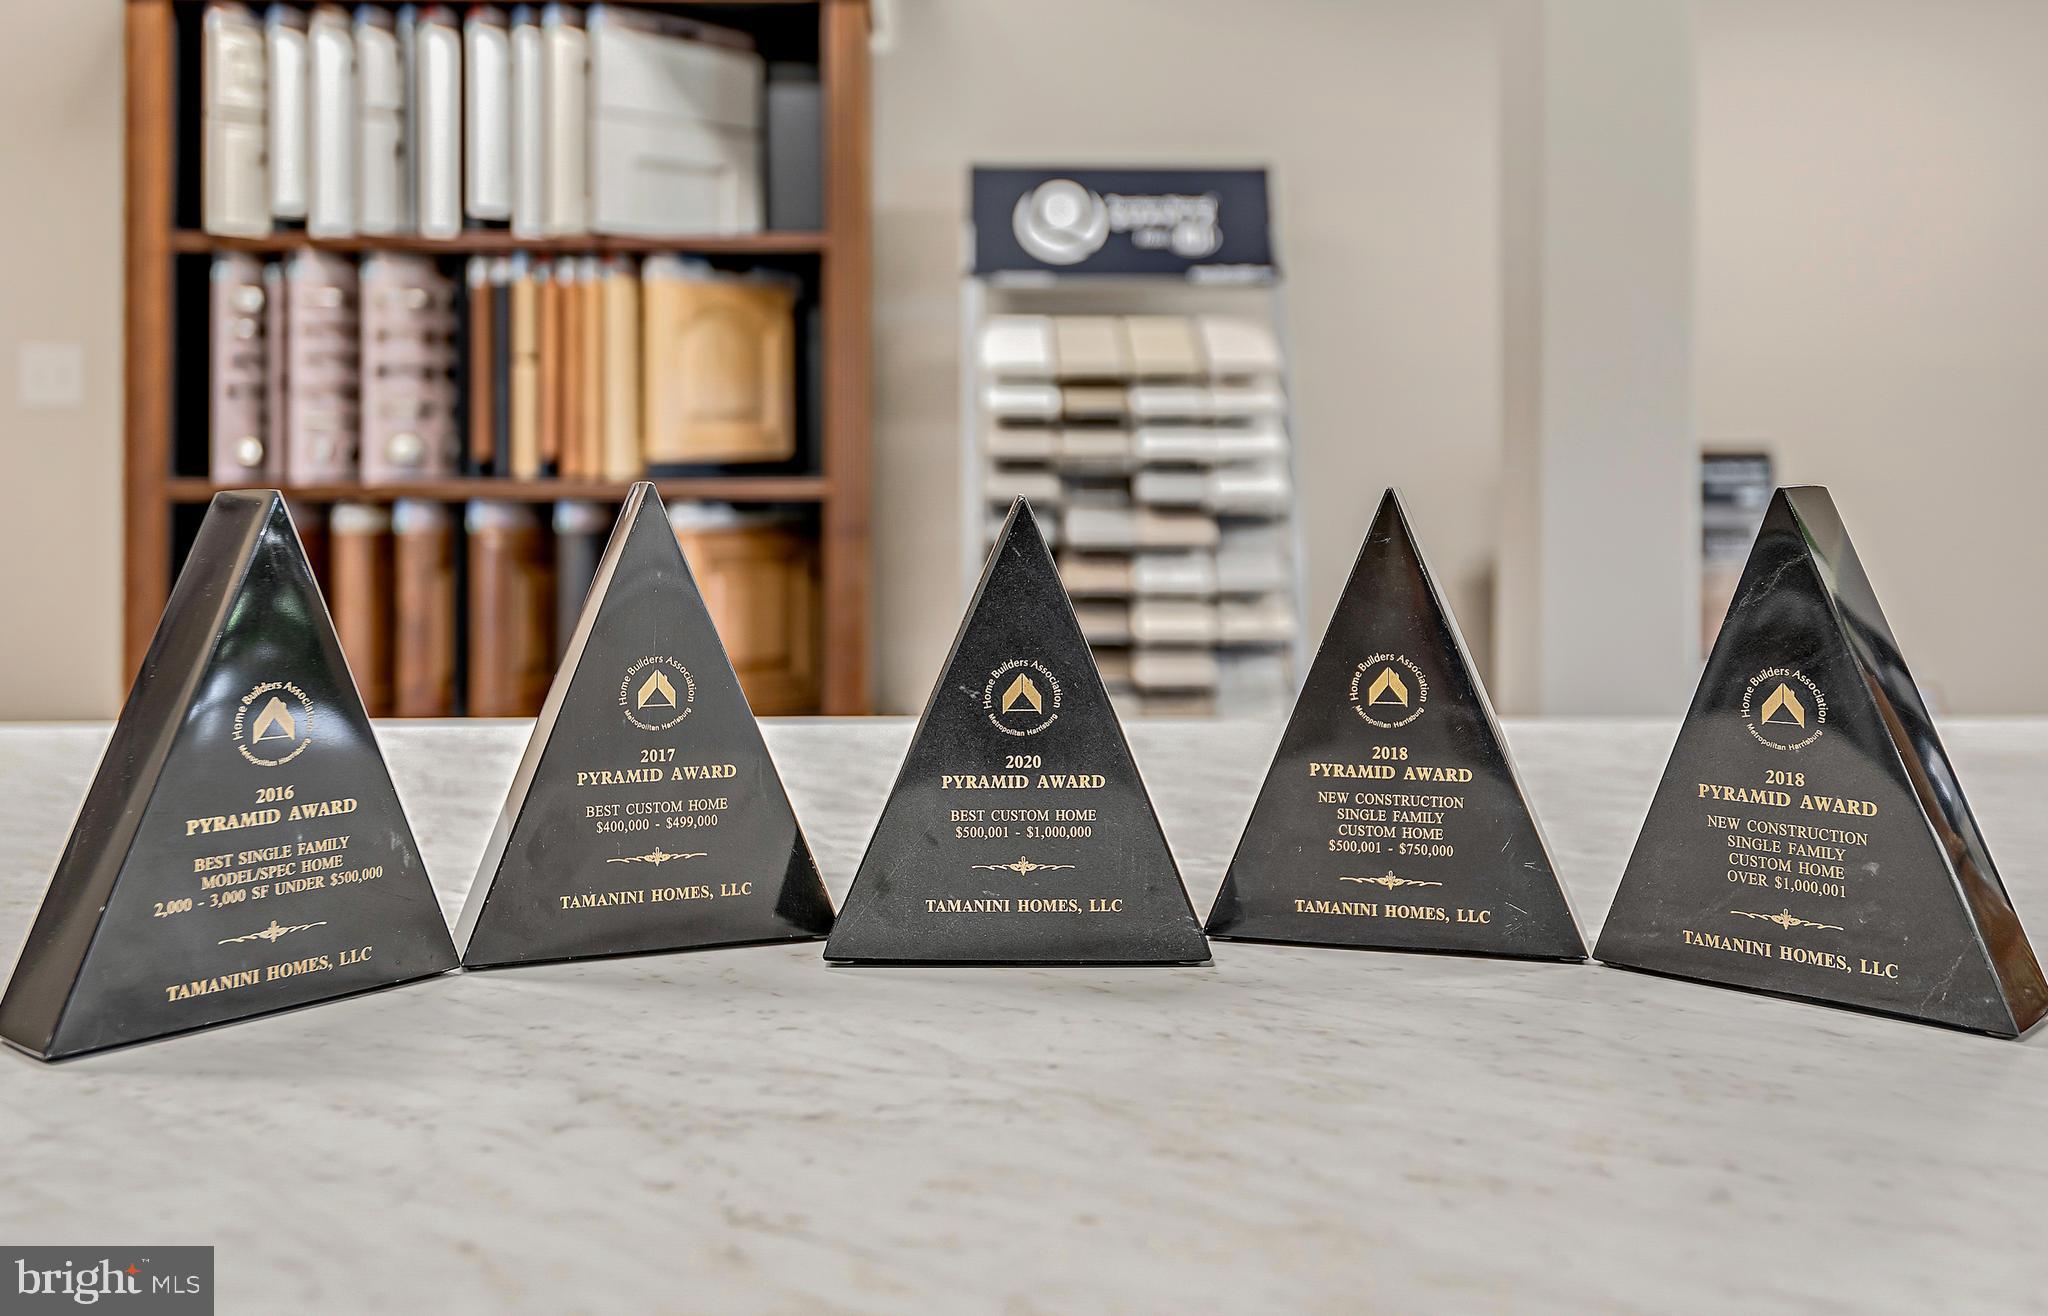 Tamanini Homes Award Winning Designs